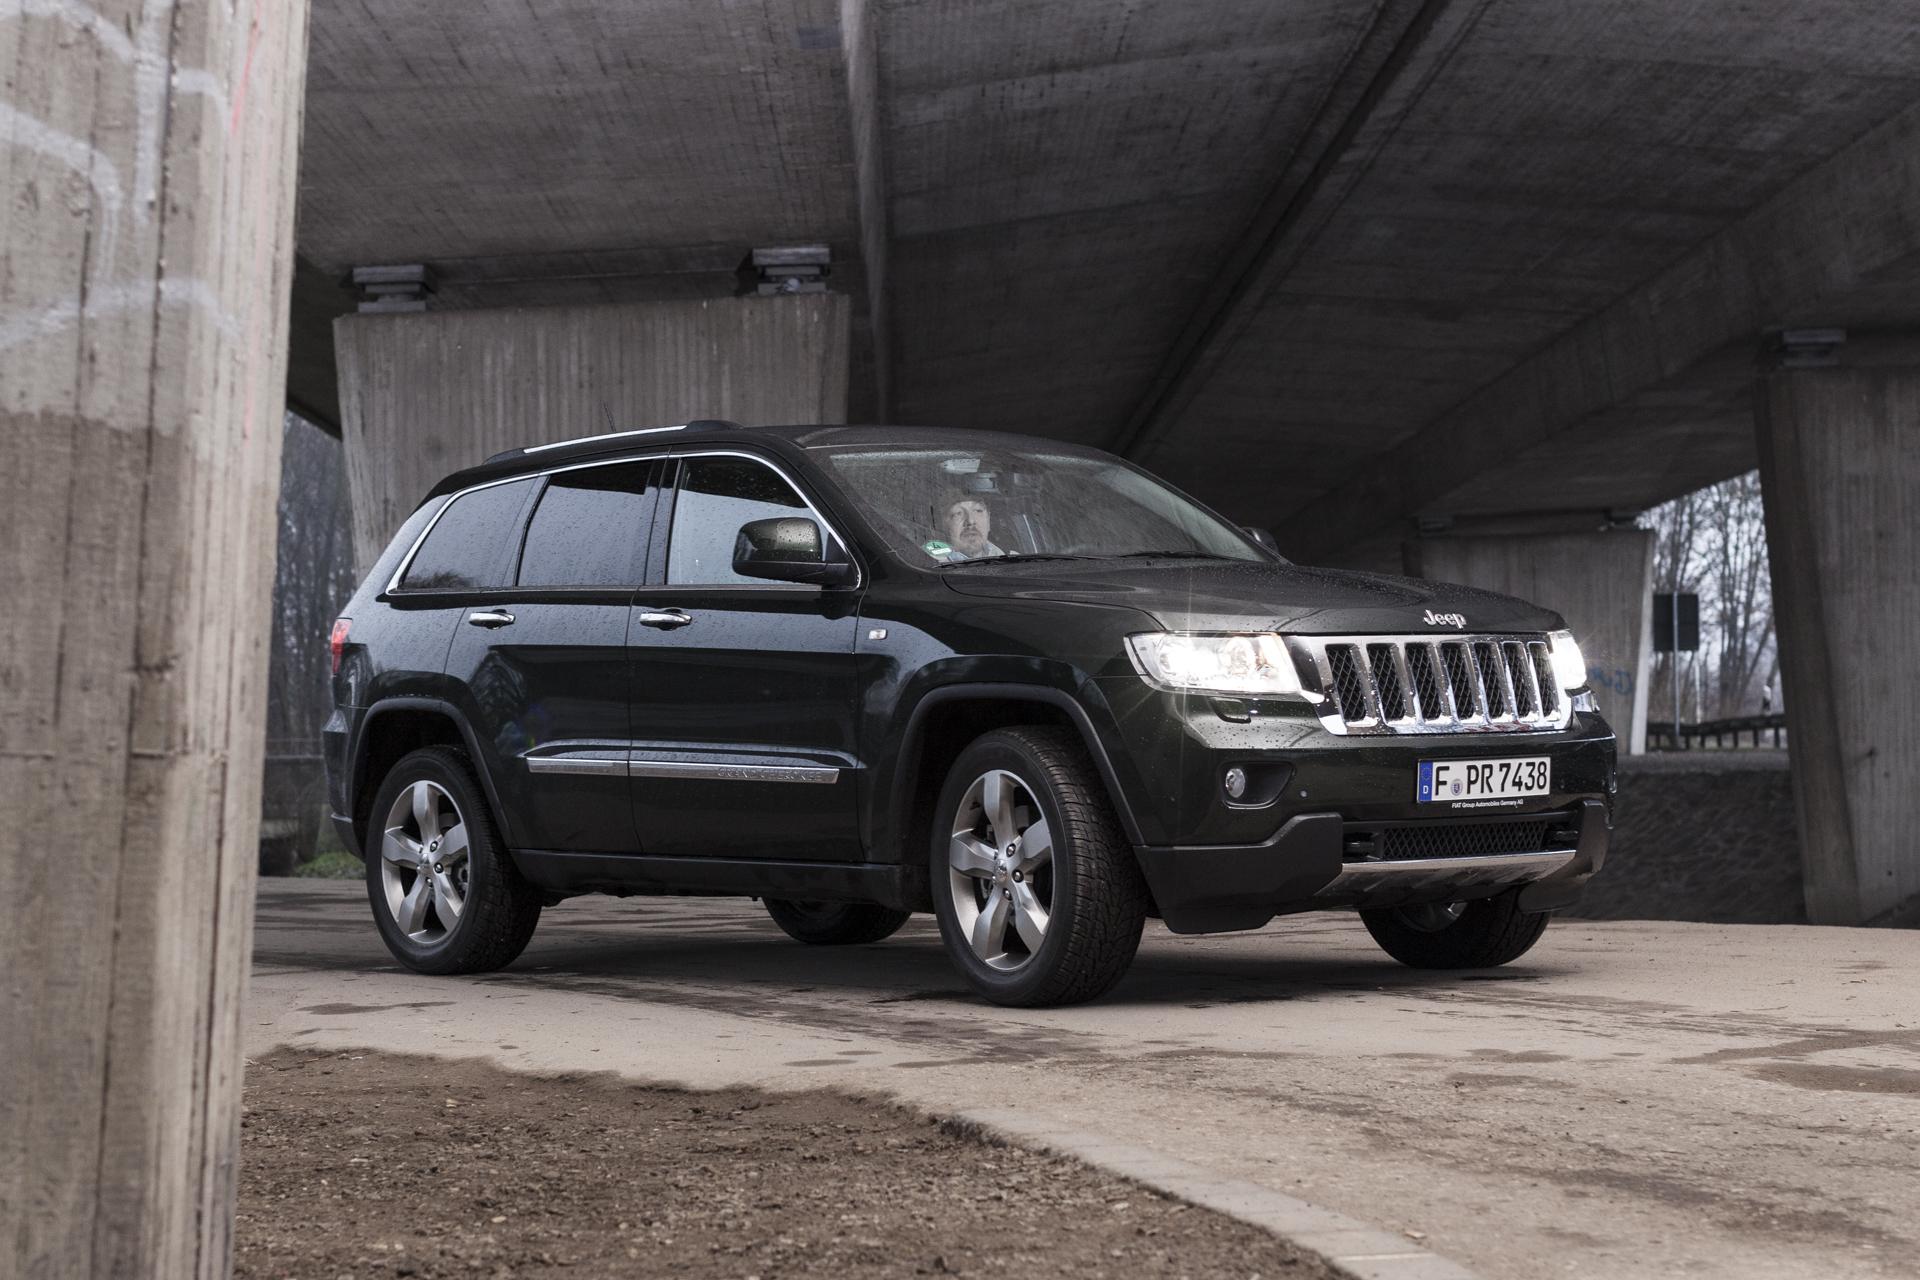 DEU, Moenchengladbach, Bernd Tölkes testet den Jeep Grand Cherokee 3.6